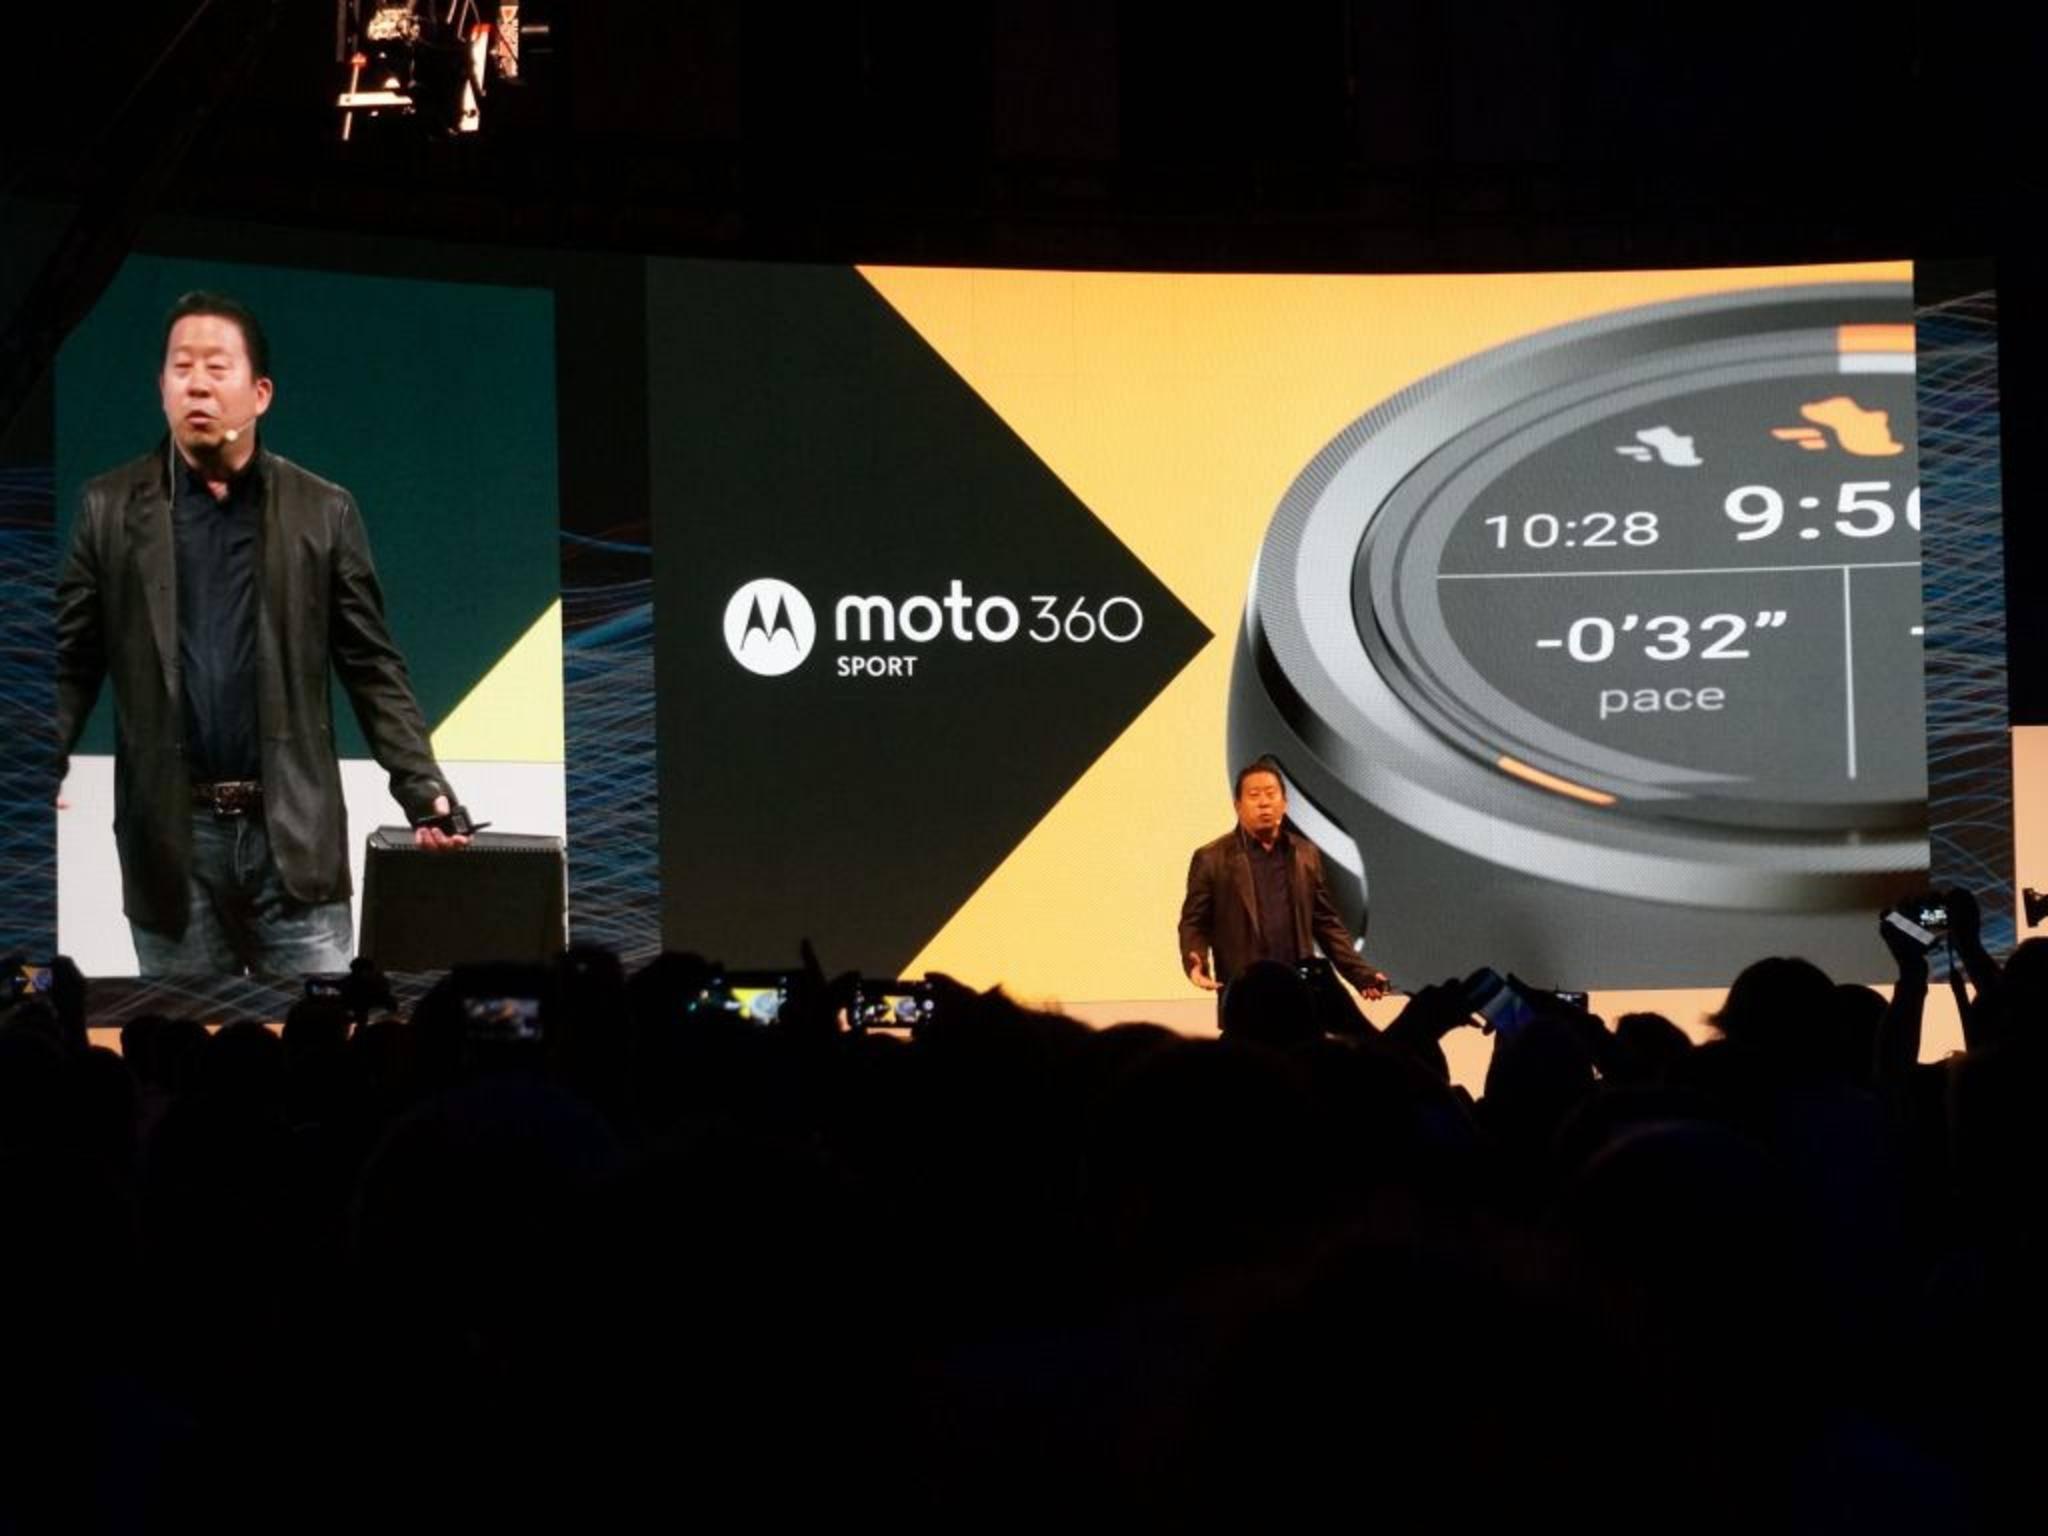 Moto 360 11